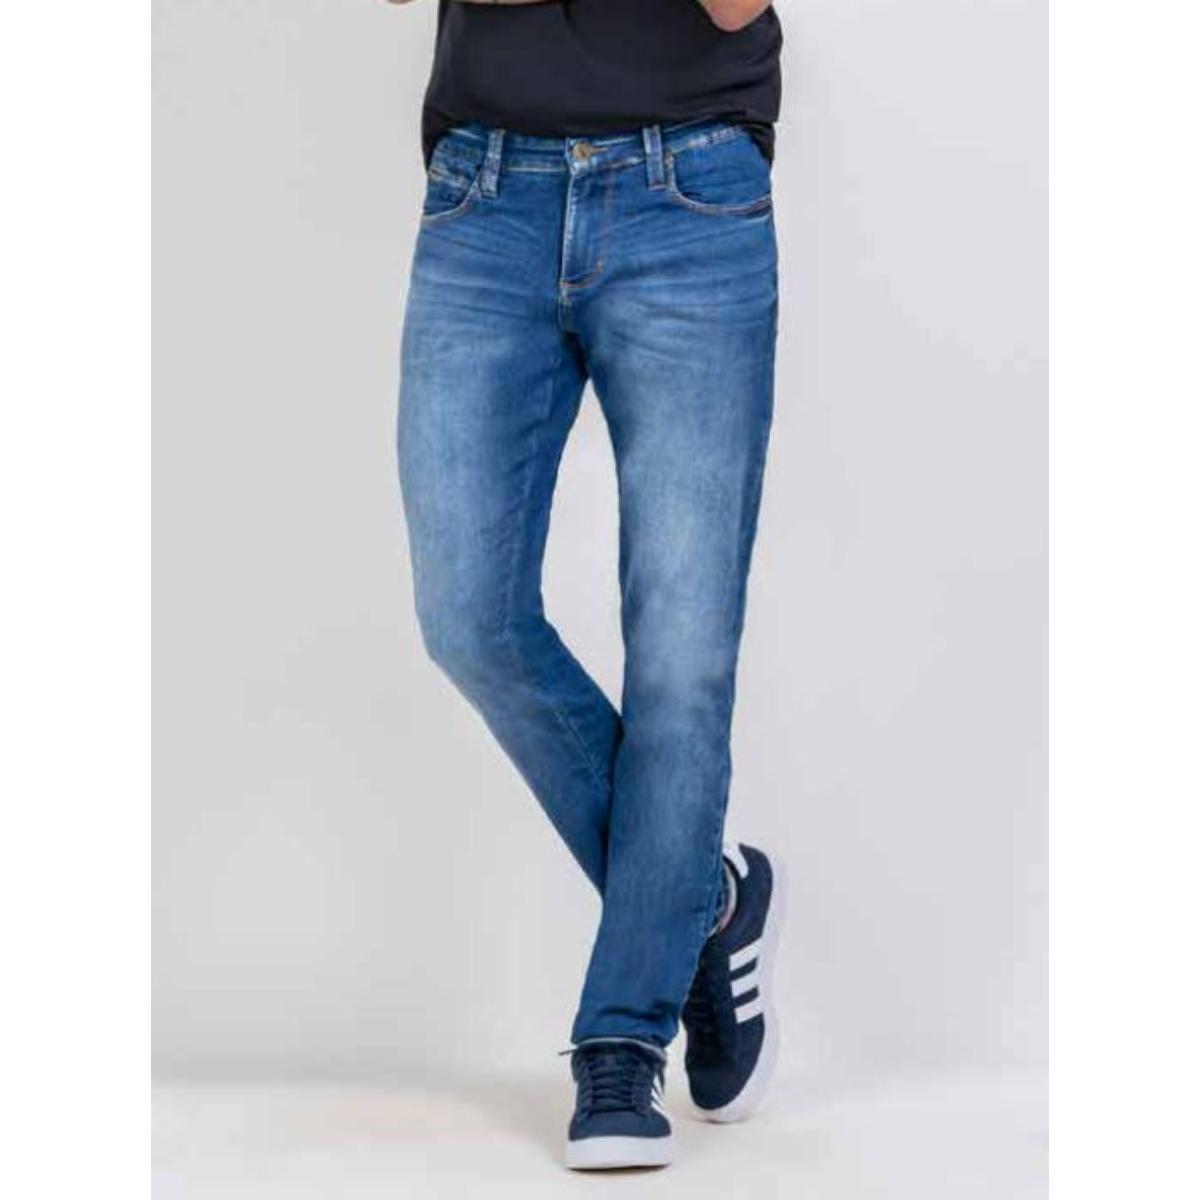 Calça Masculina Kacolako K37830 Jeans